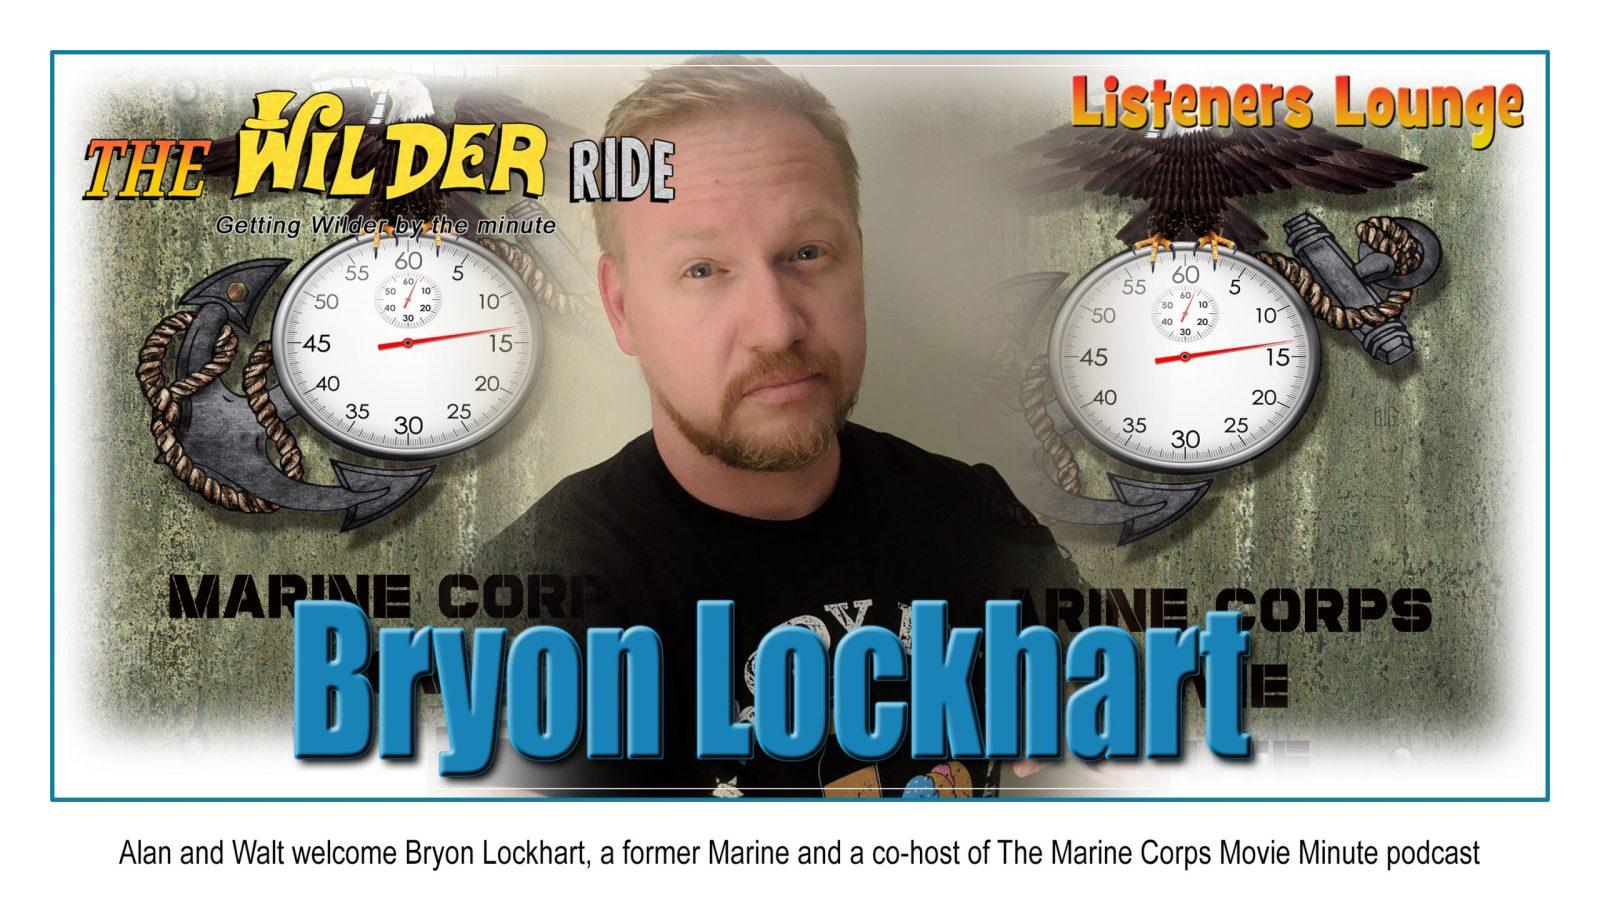 Bryon Lockhart